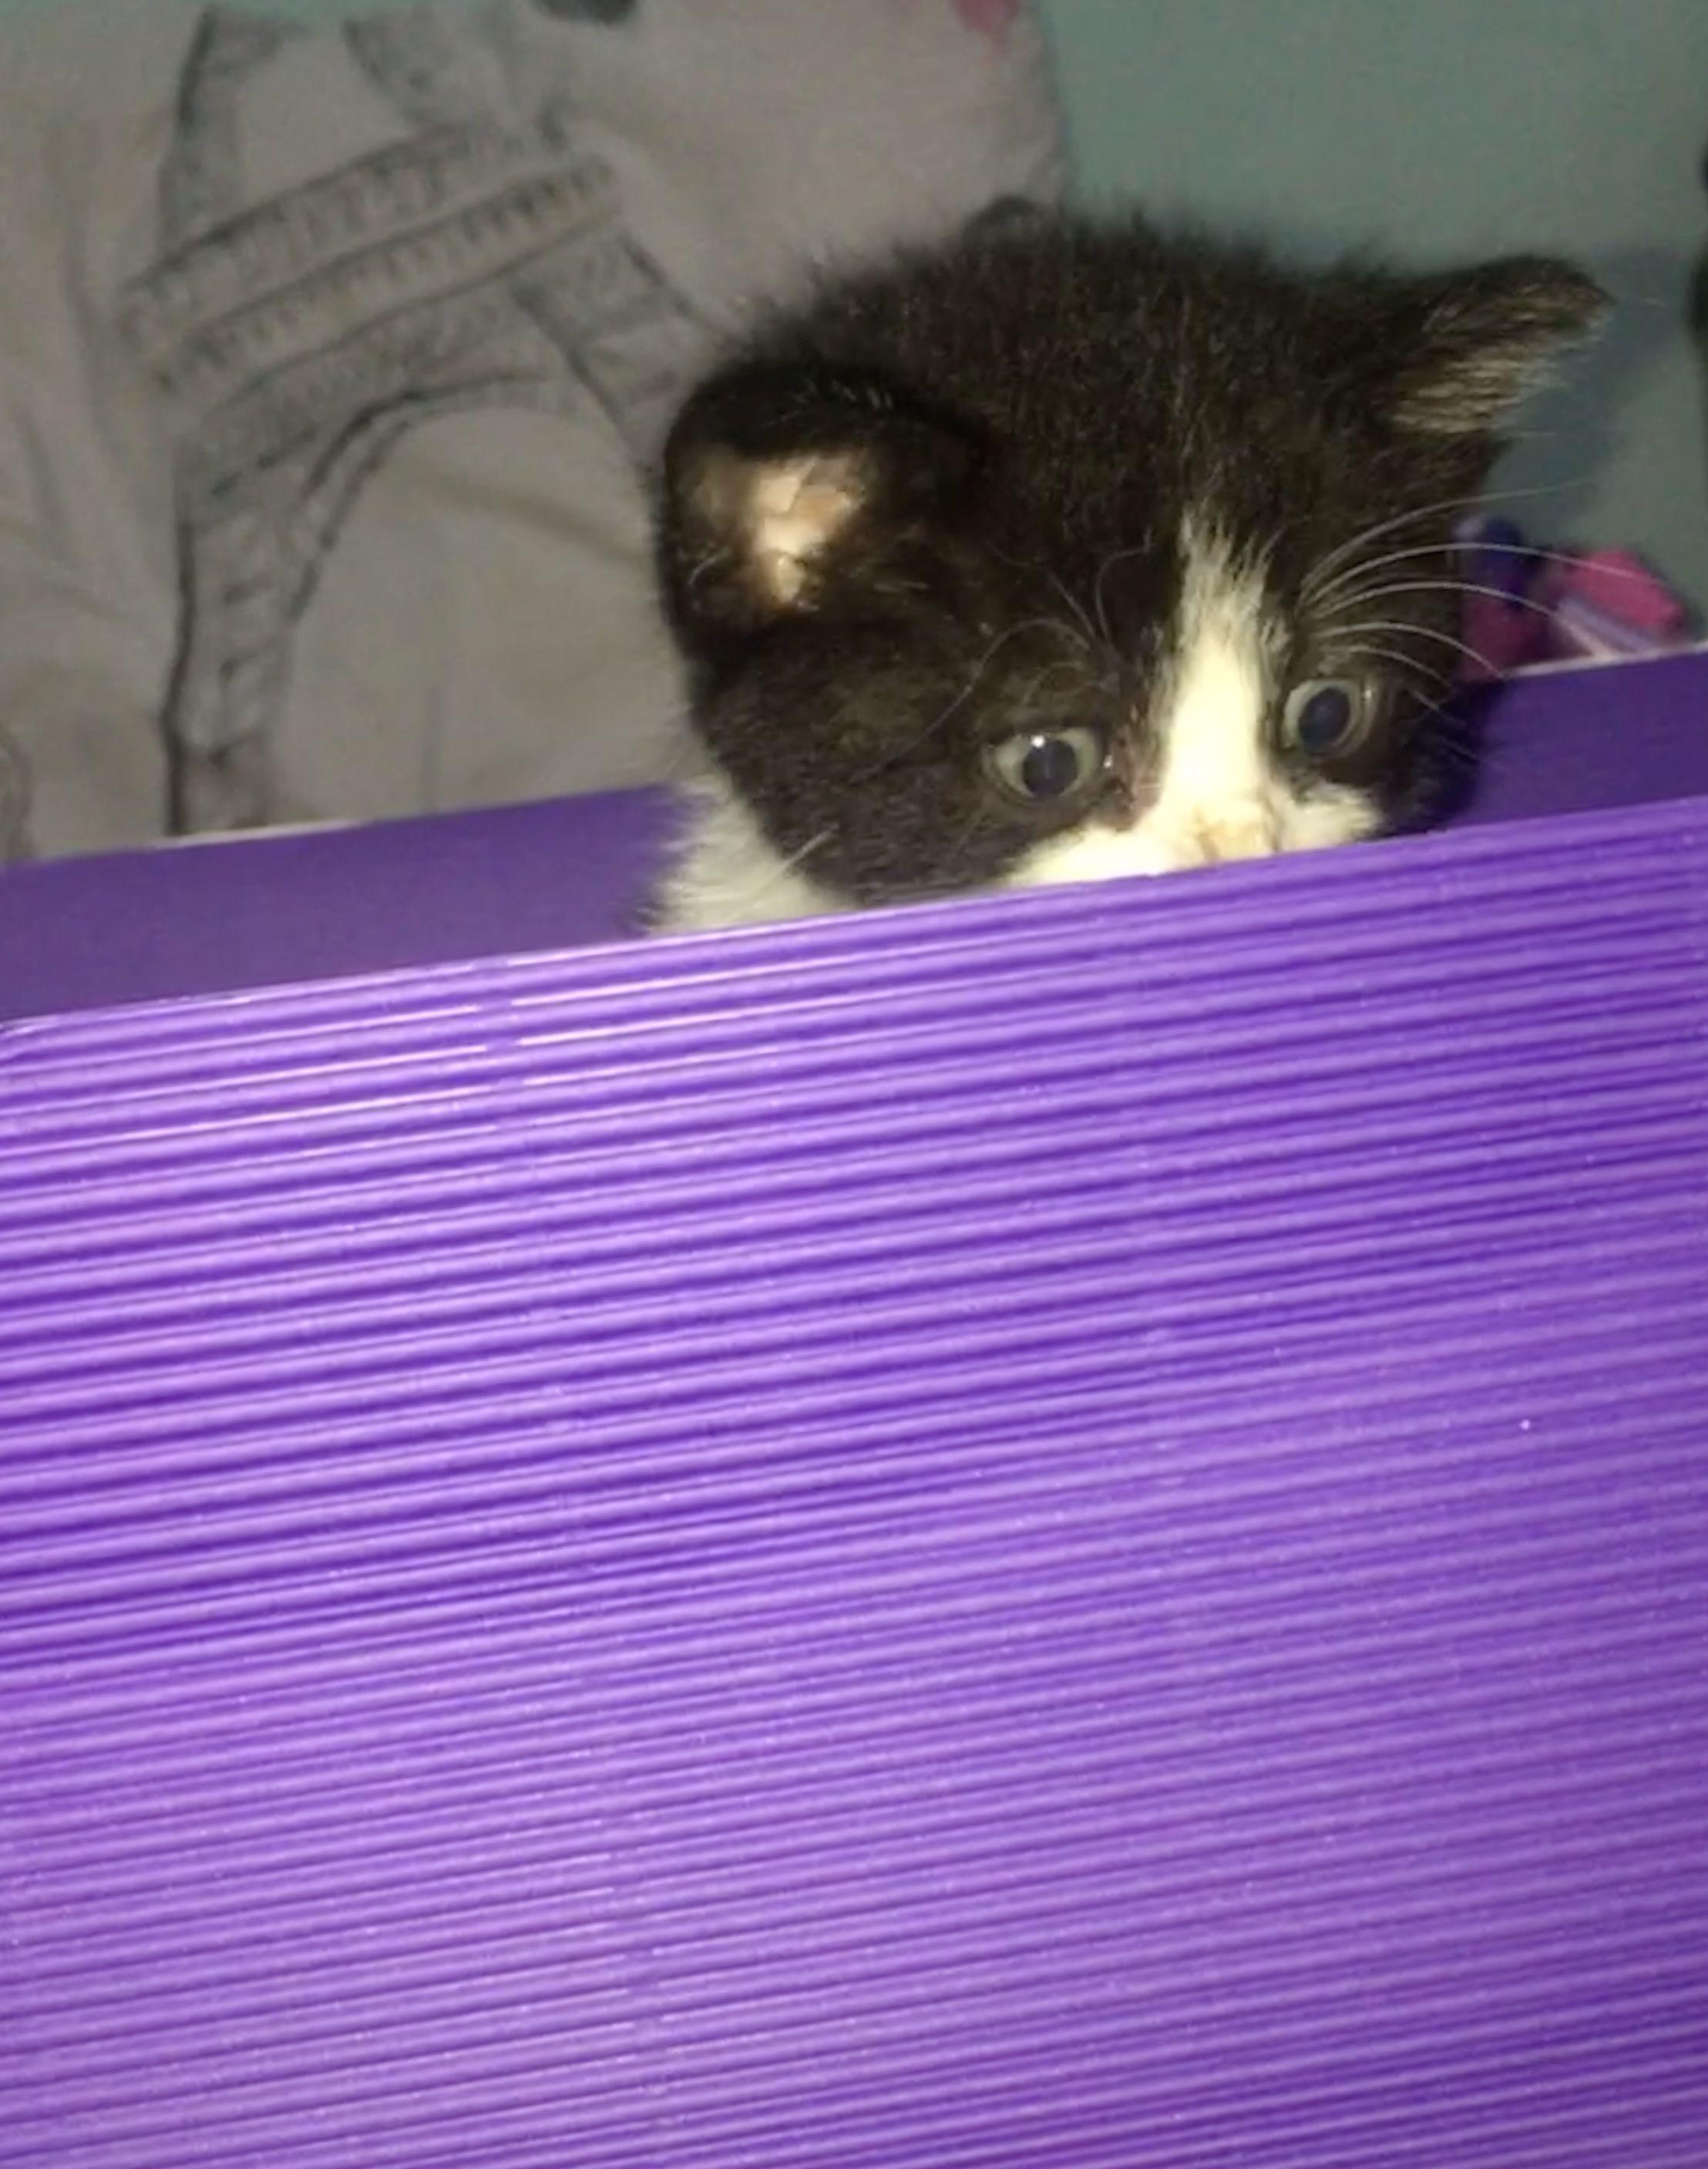 #funnycats #kitty #cats #cutestanimals #beautifulcats #catlovers #kittens #photo #animals